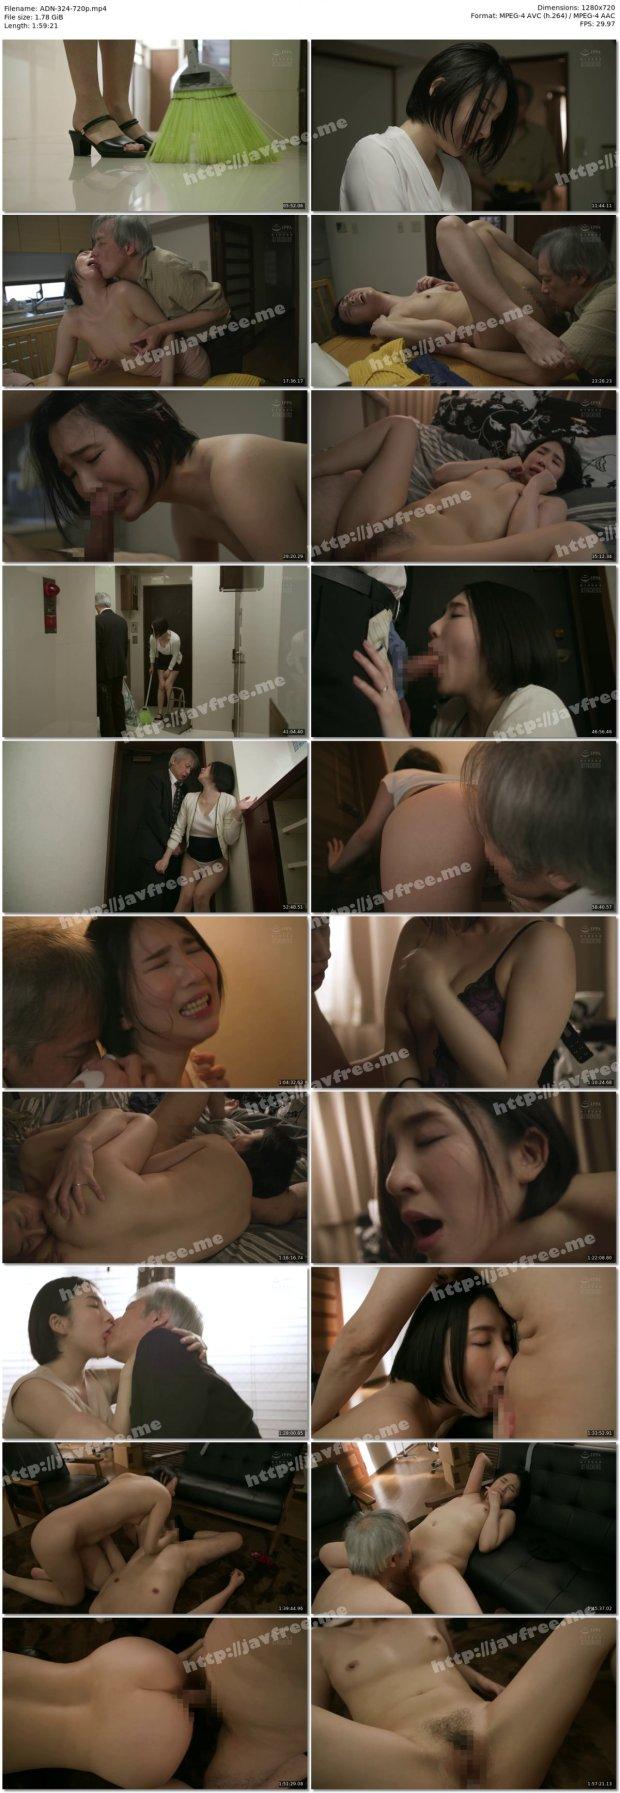 [HD][ADN-324] 秘蜜の愛人 泥沼のように溺れた不貞性交 舞原聖